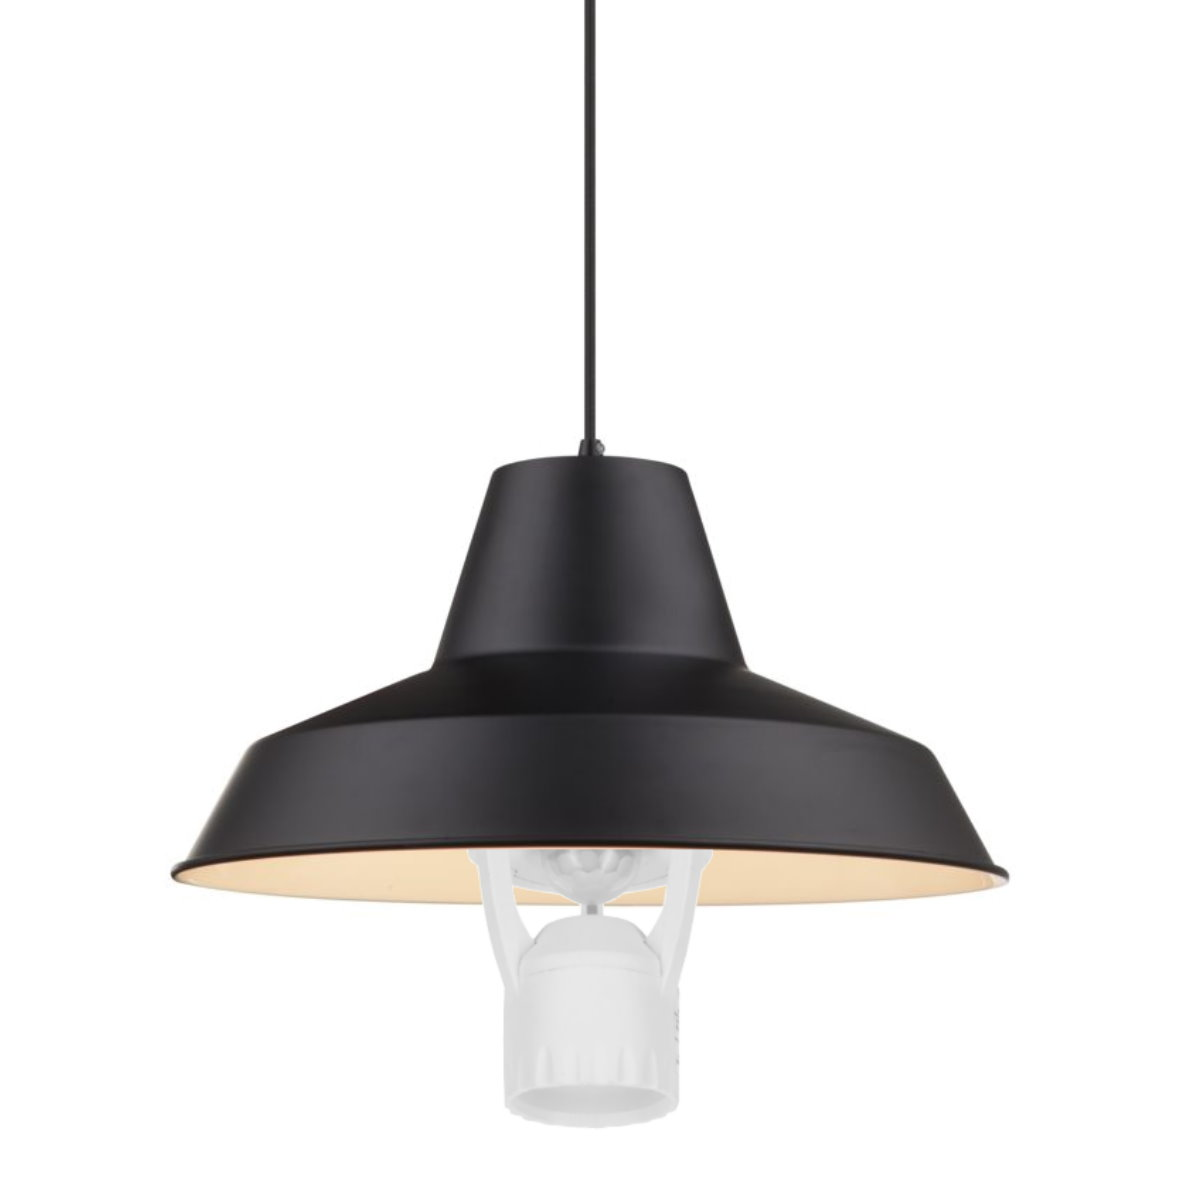 e27 lampenfassung mit pir bewegungsmelder led geeignet. Black Bedroom Furniture Sets. Home Design Ideas